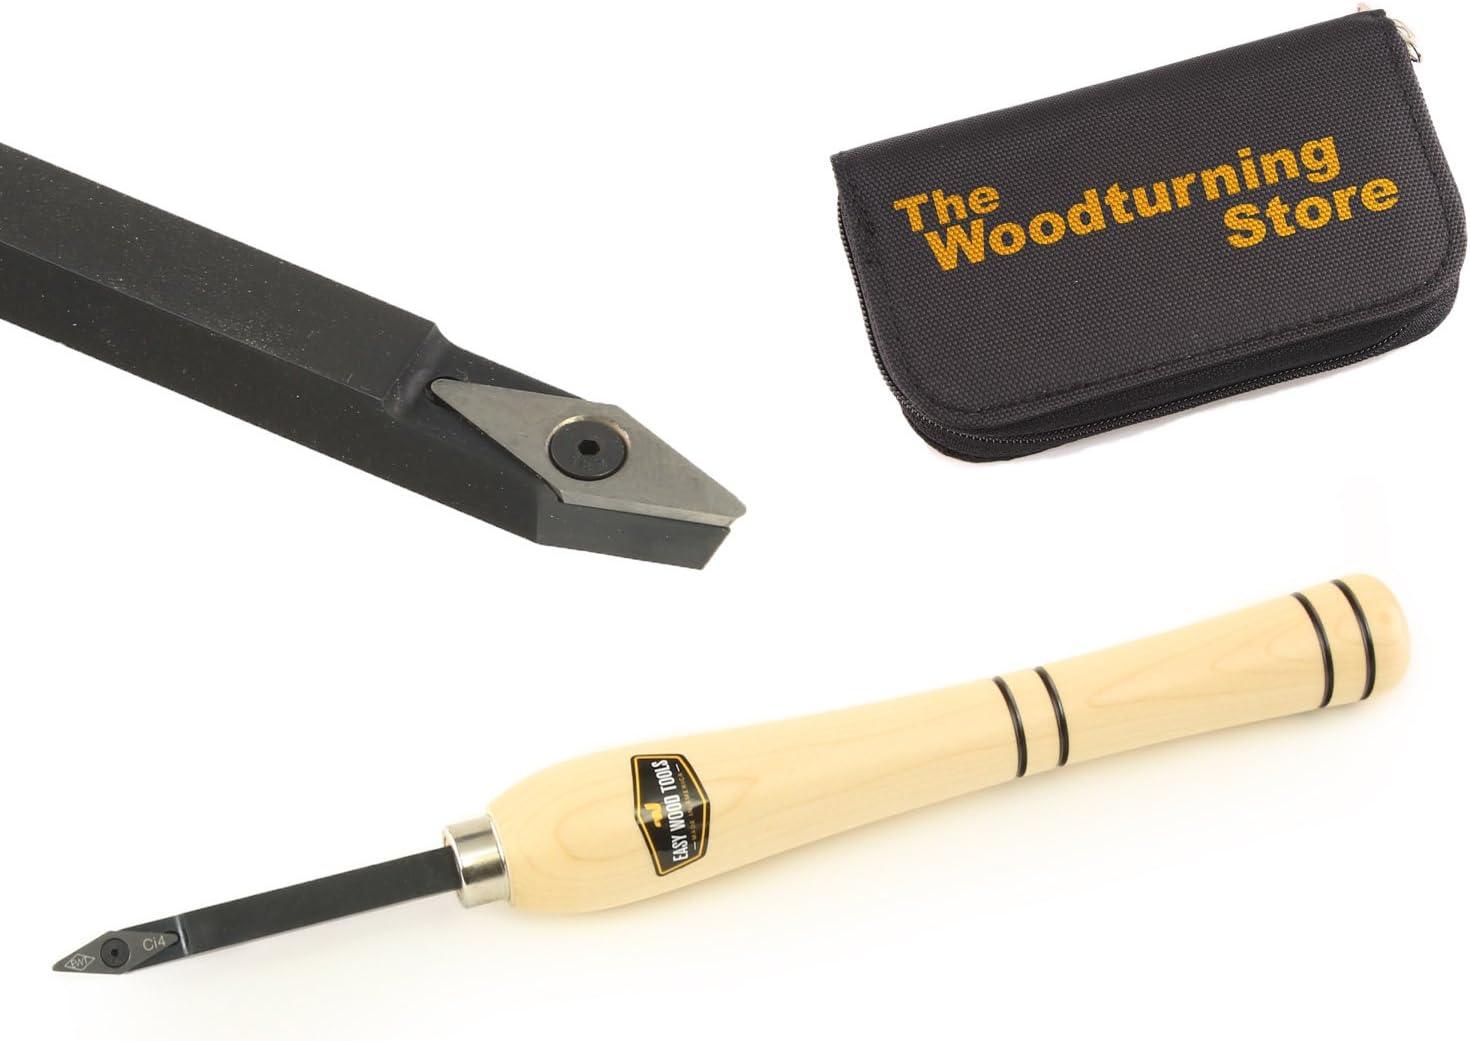 Easy Wood Tools 9720 Start with Woodturnin Same day shipping Detailer 5 ☆ very popular BONUS